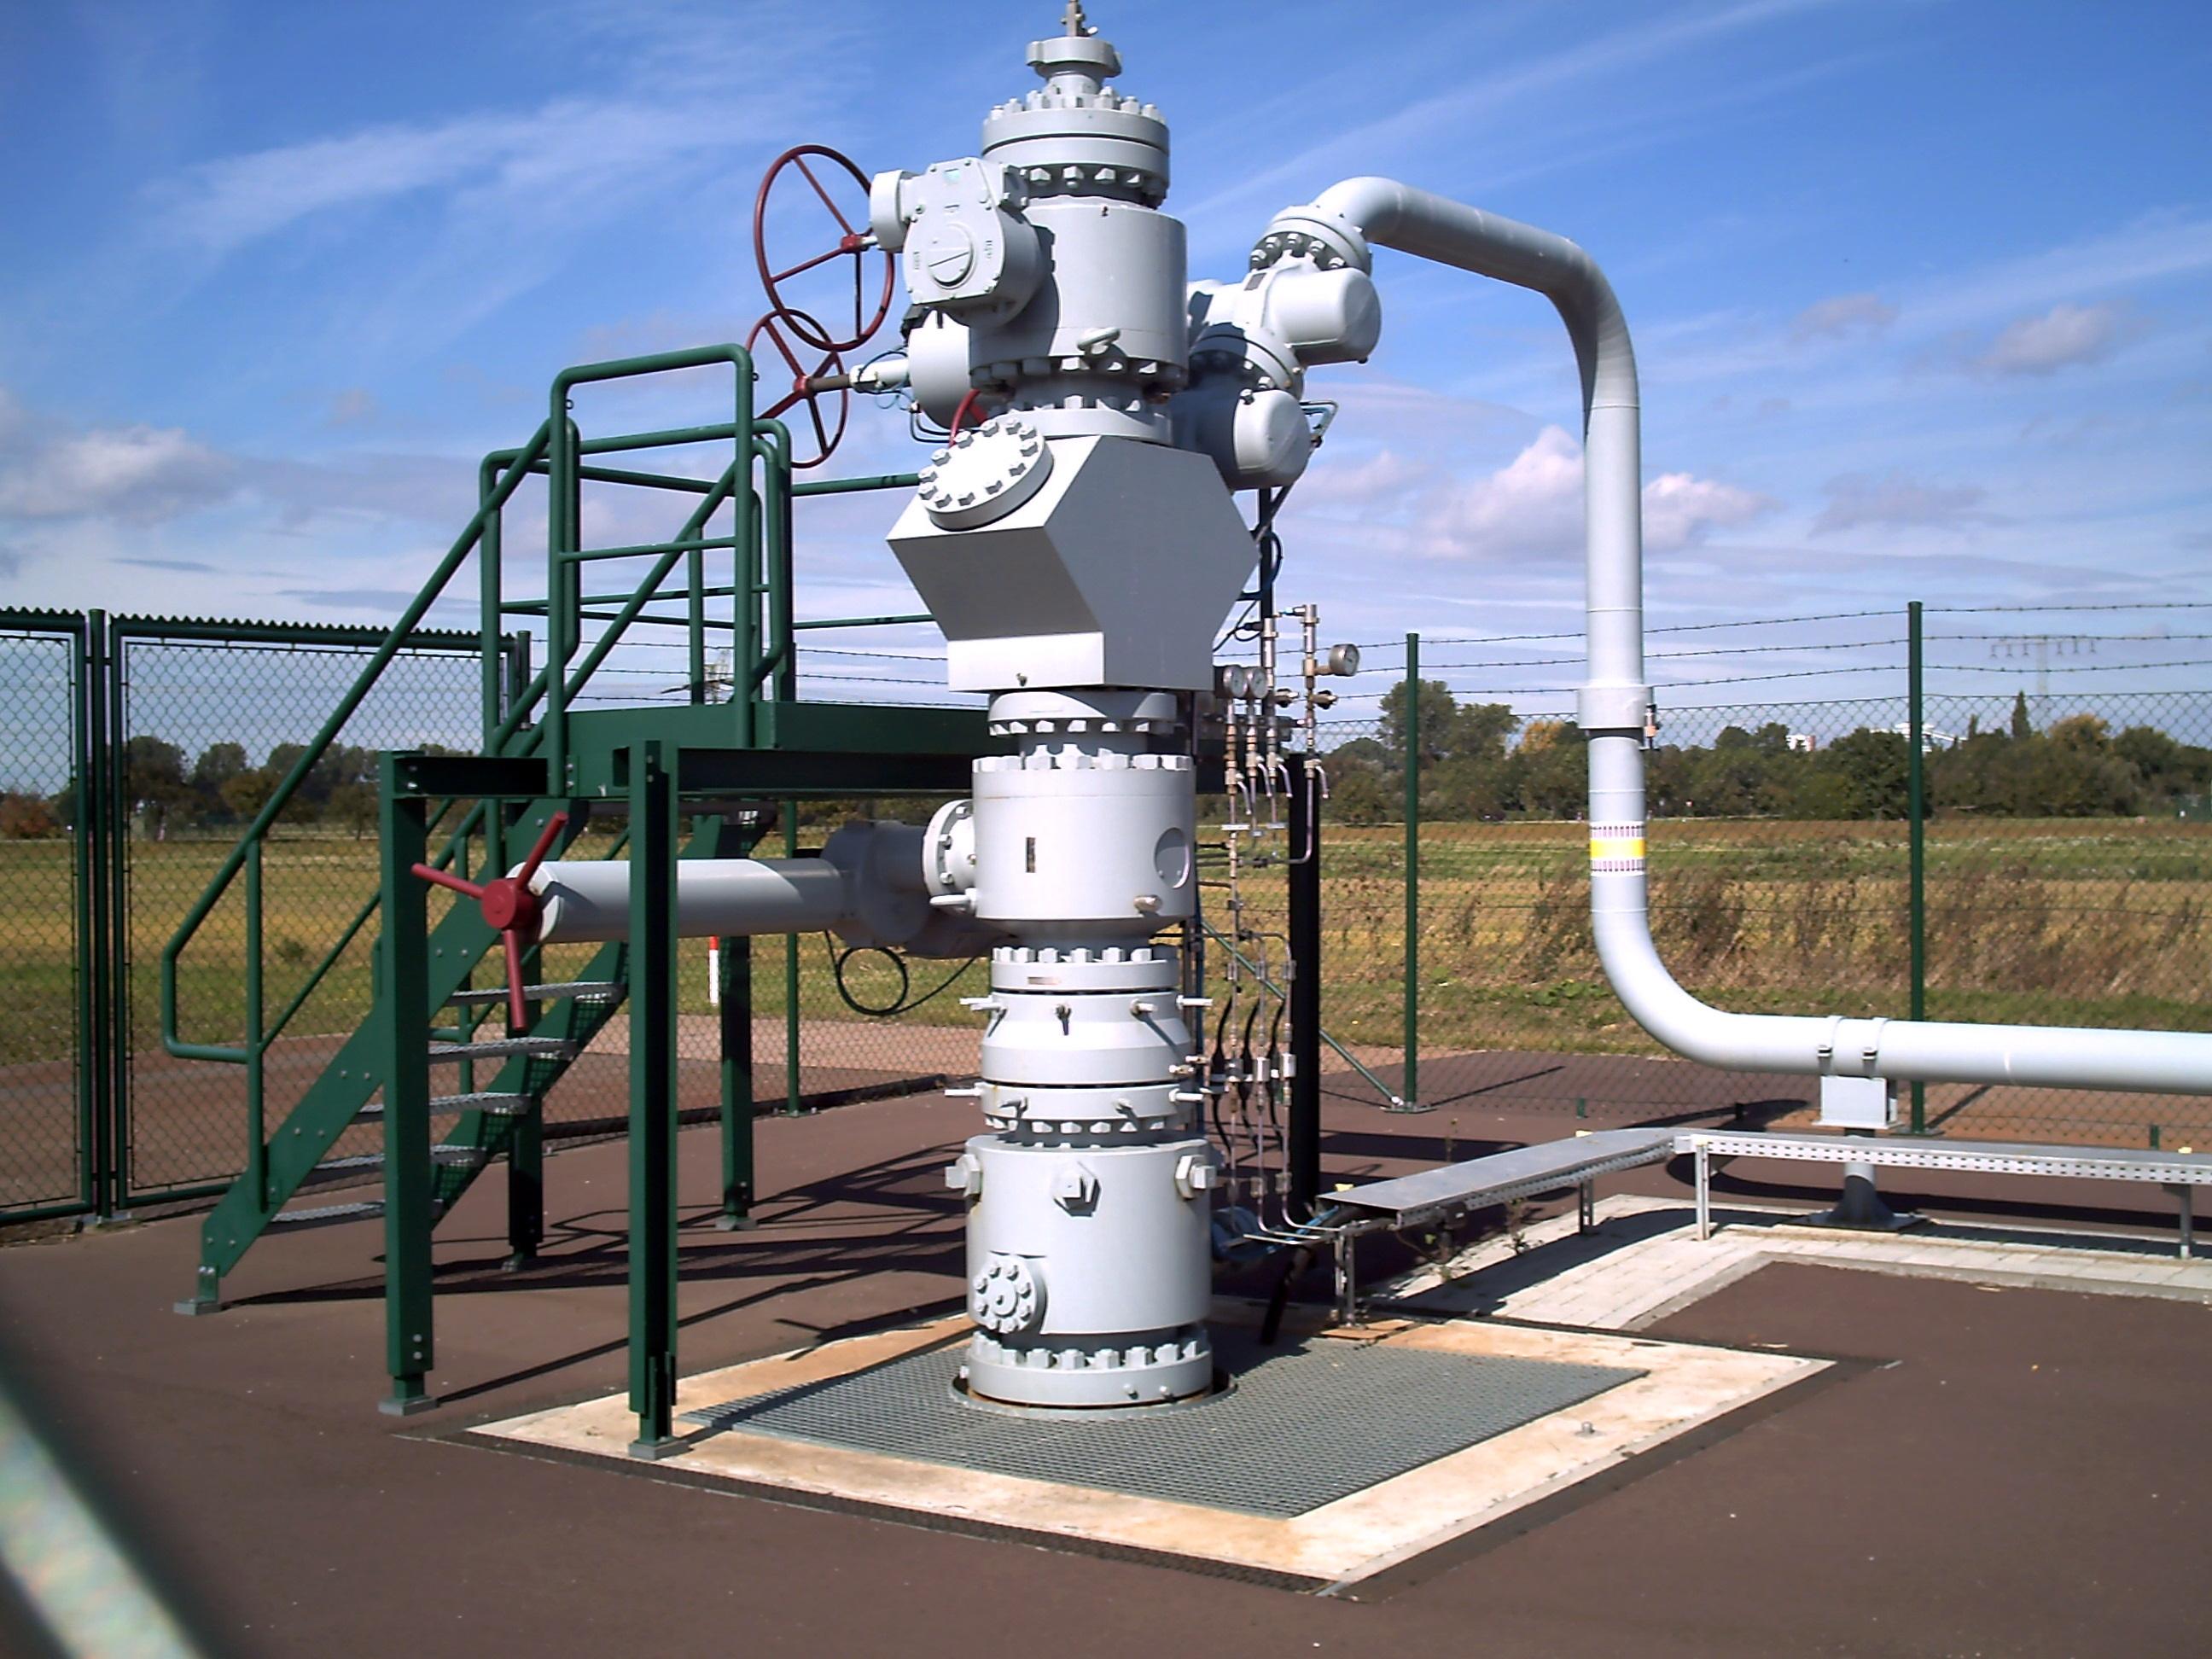 Wellhead Bohrlochkopf on Gas Lift Well Diagram